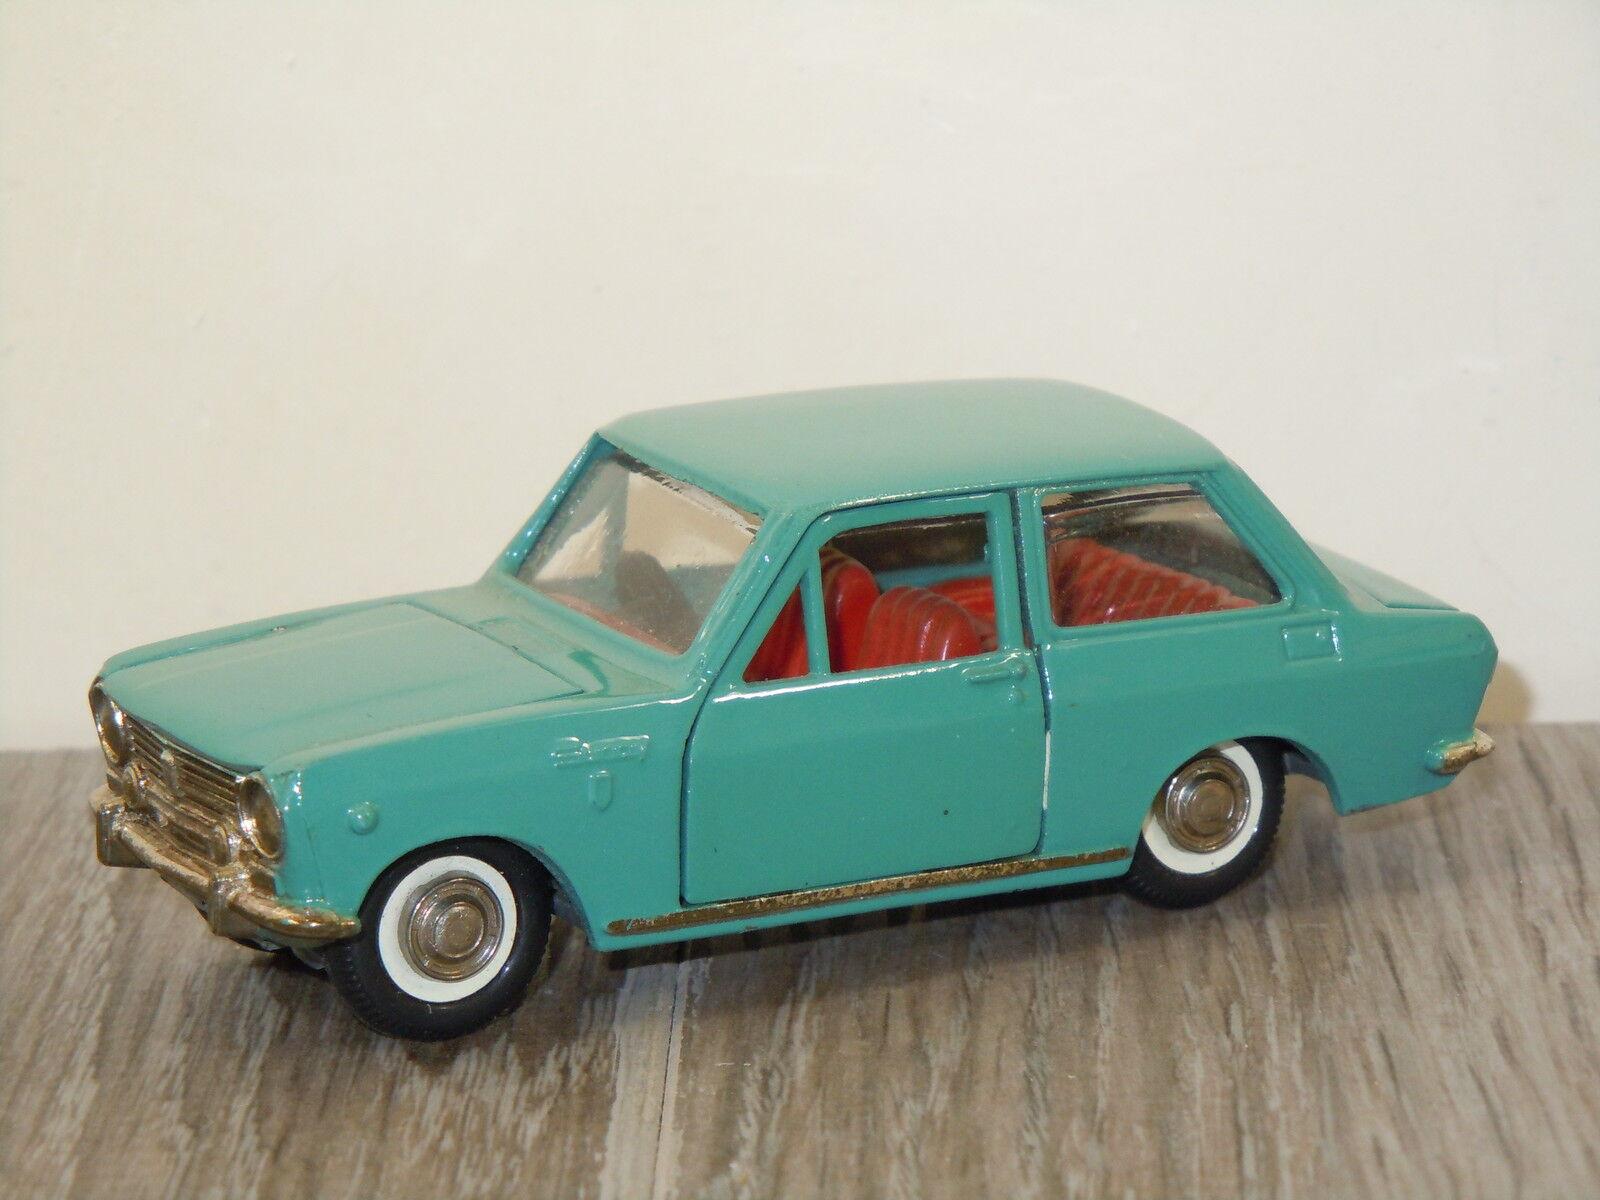 Datsun Sunny 1000 van Diapet Yonezawa Toys D-154 Japan 3587